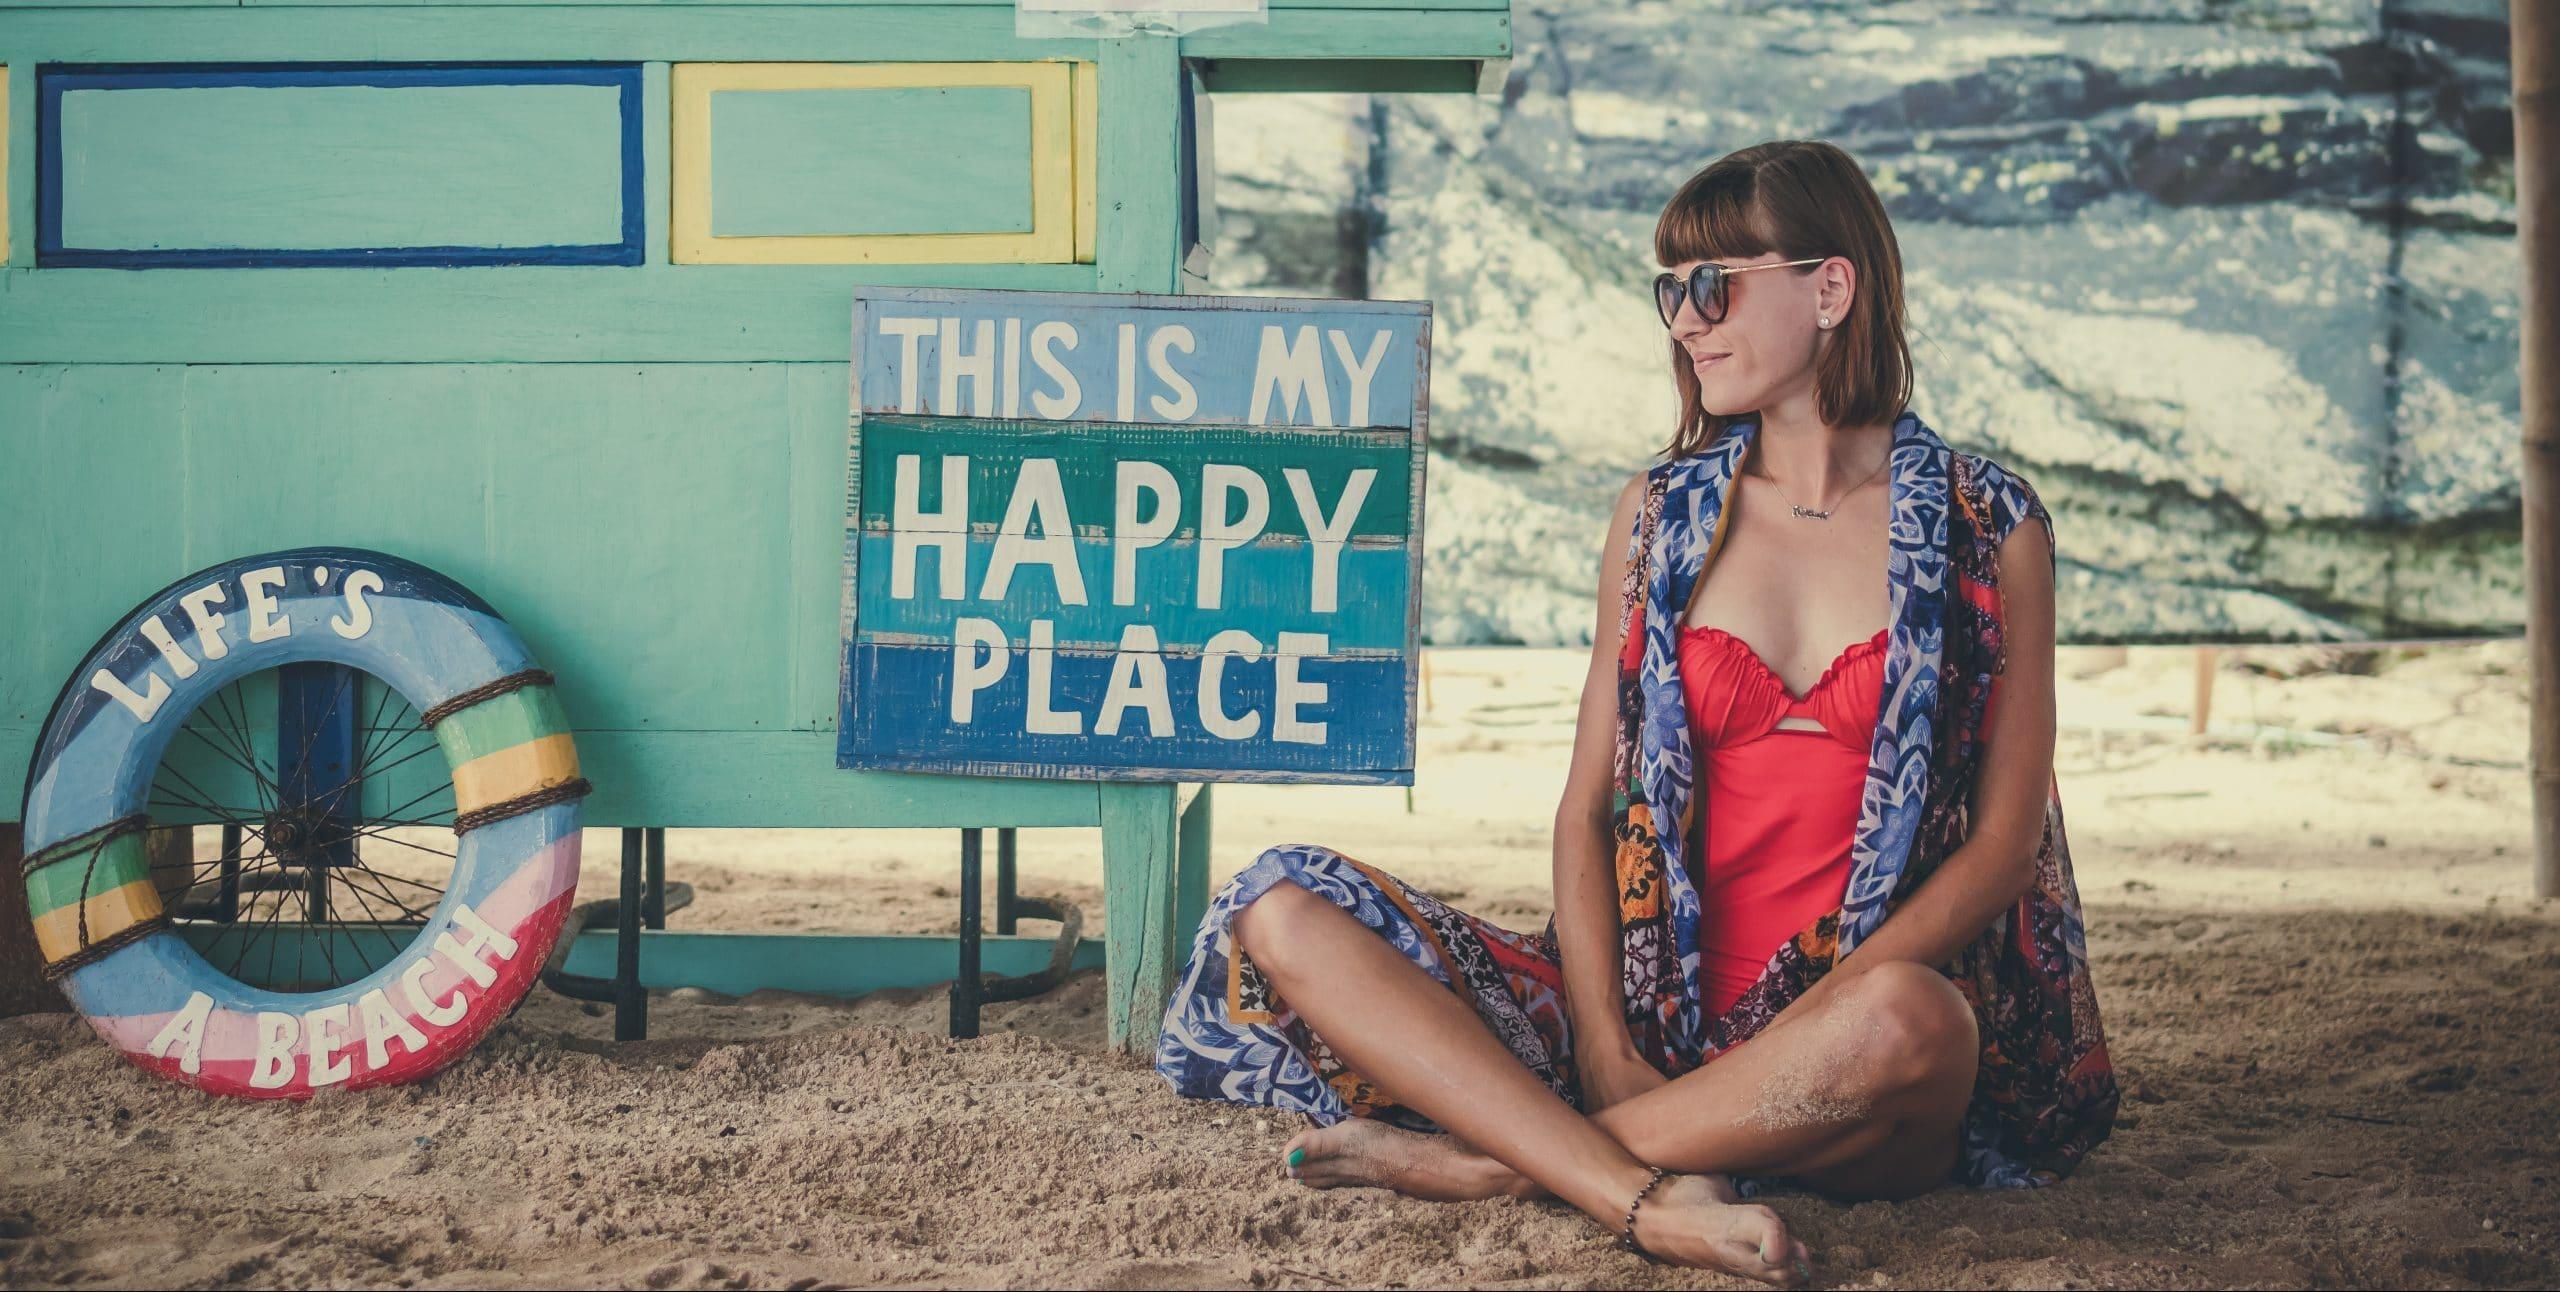 wellbeing on a beach